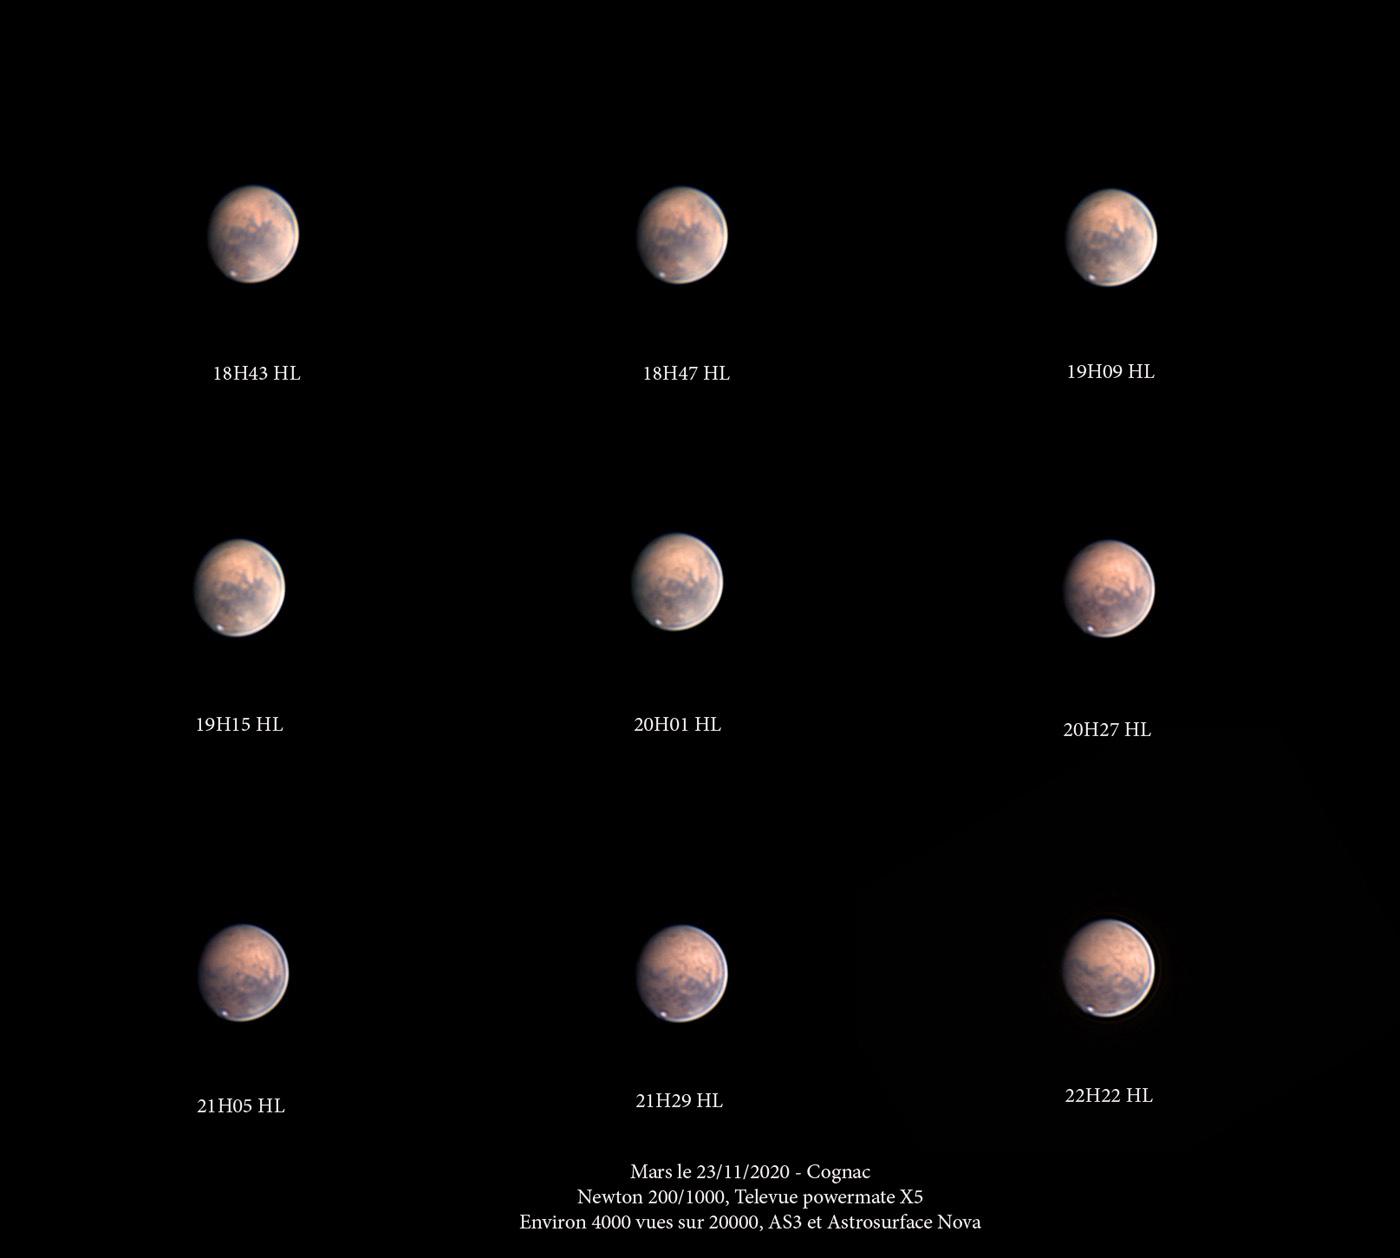 Mars_20201123_1842a2211_planche.jpg